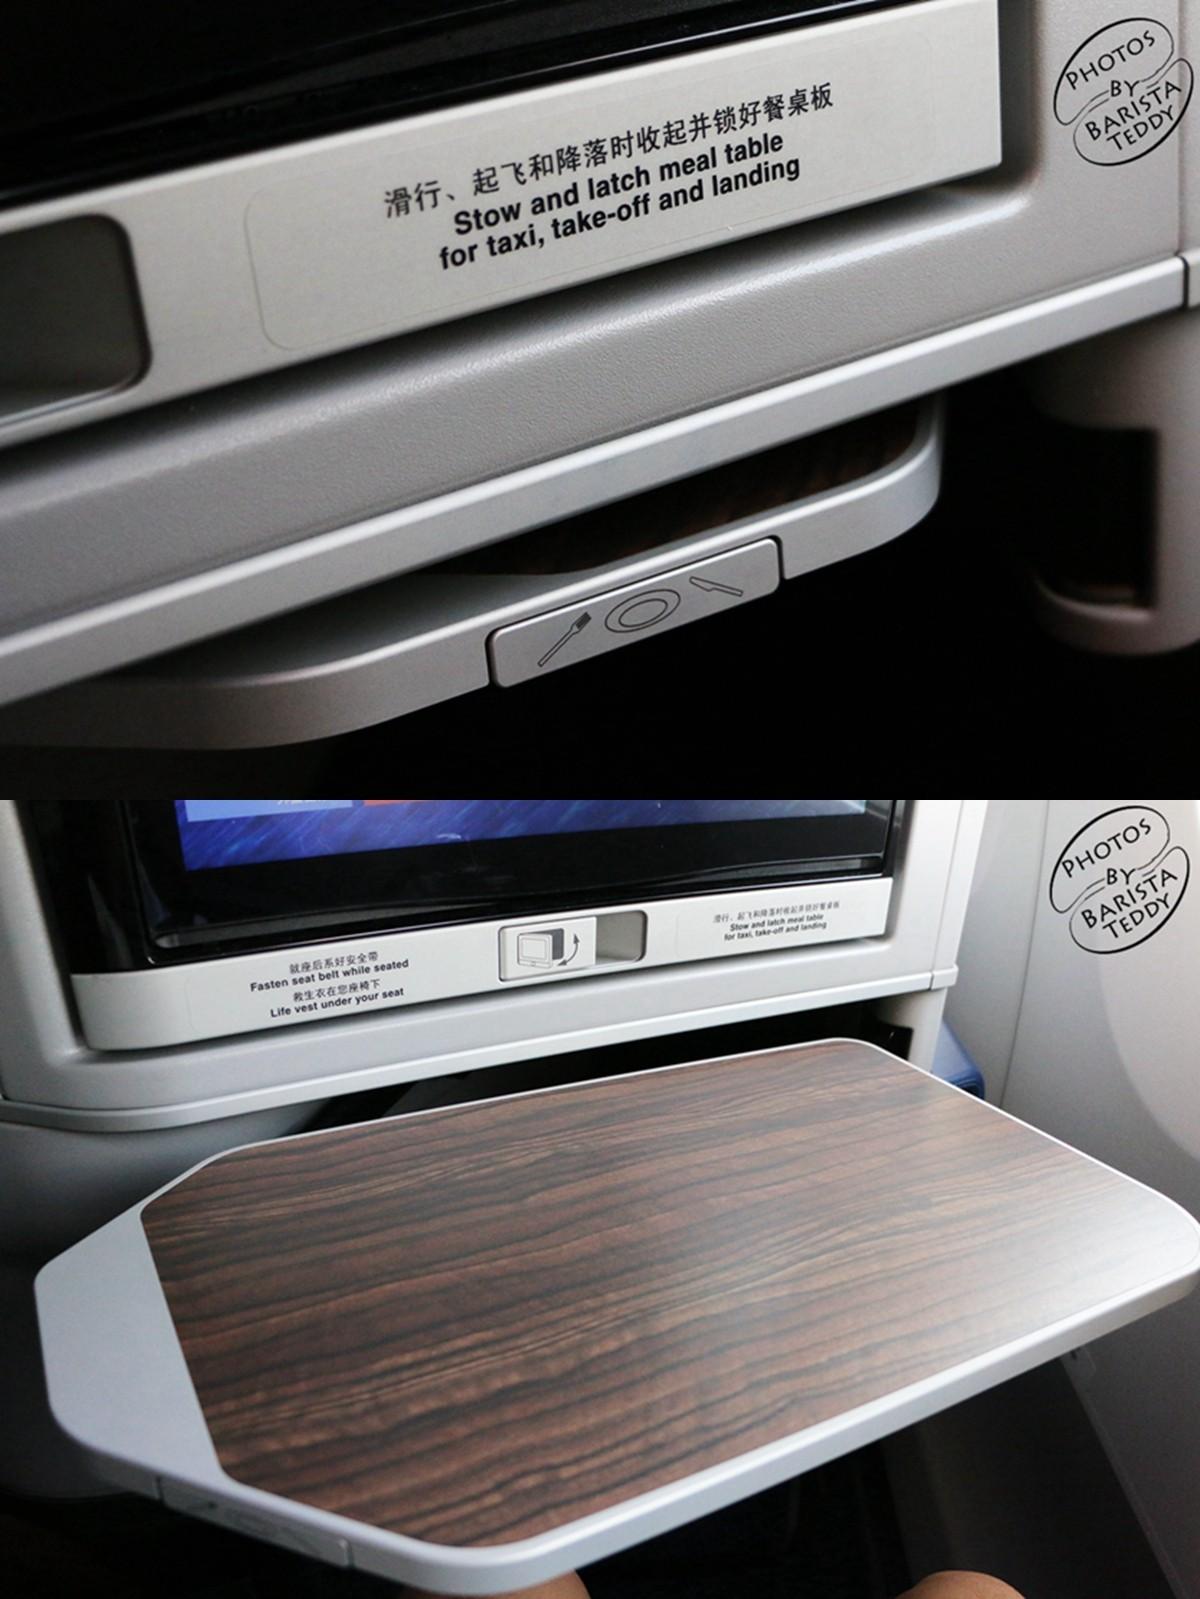 Re:[原创]【仔糕游记27】【A350双杀·第二季】【下】中国南方航空A350游记·过紧日子的我航上海航线·CZ3503 CAN-SHA